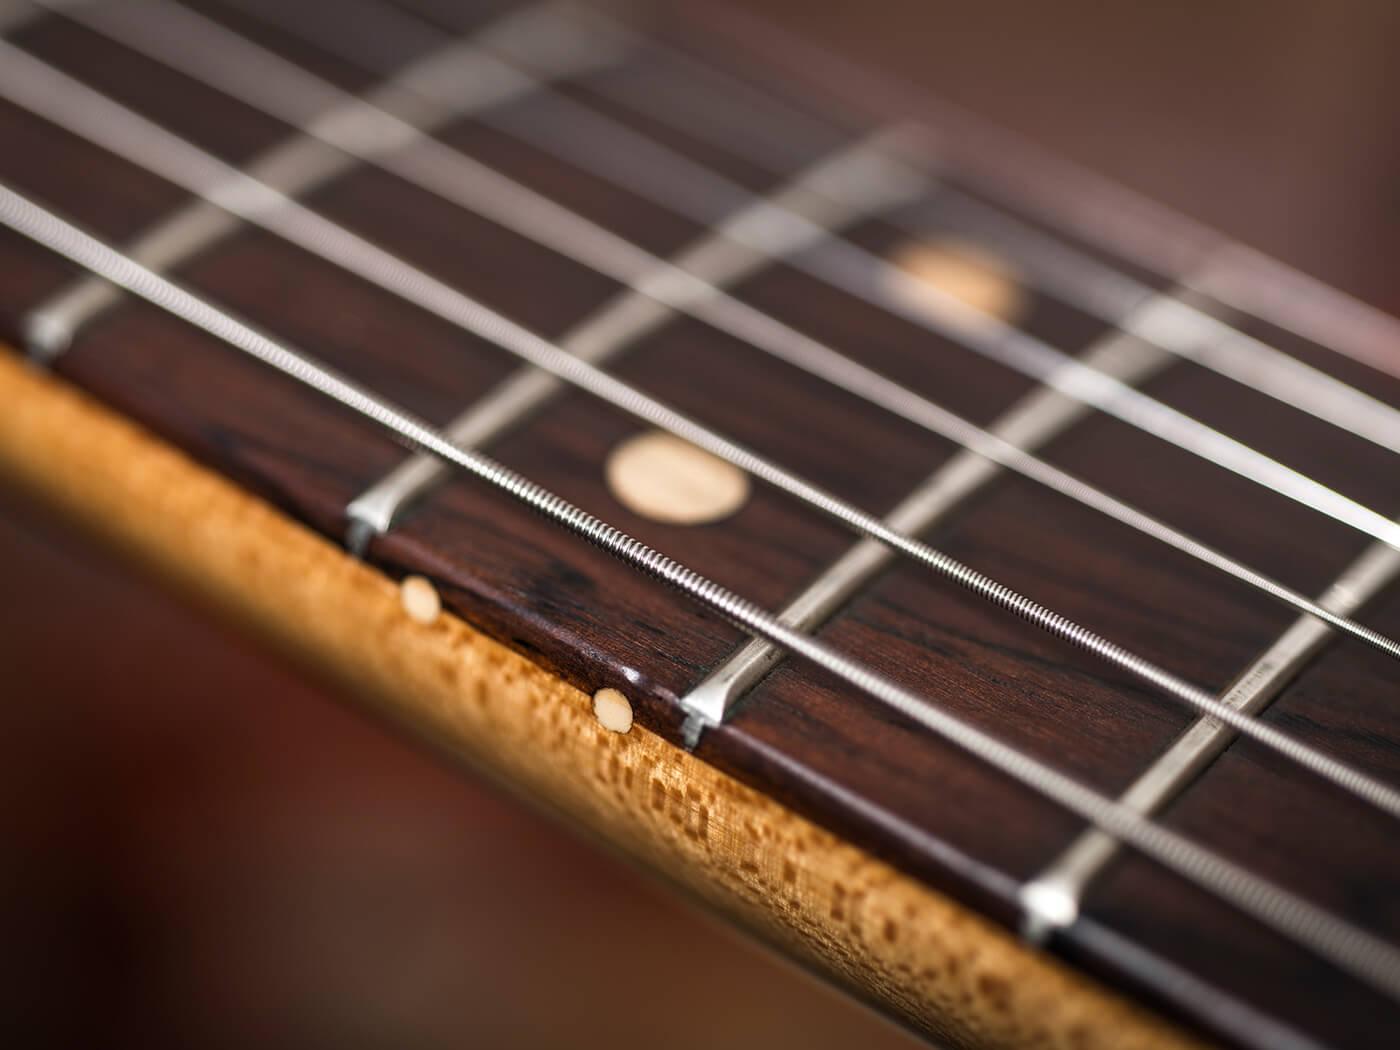 1963 Fender Esquire (Fretboard)